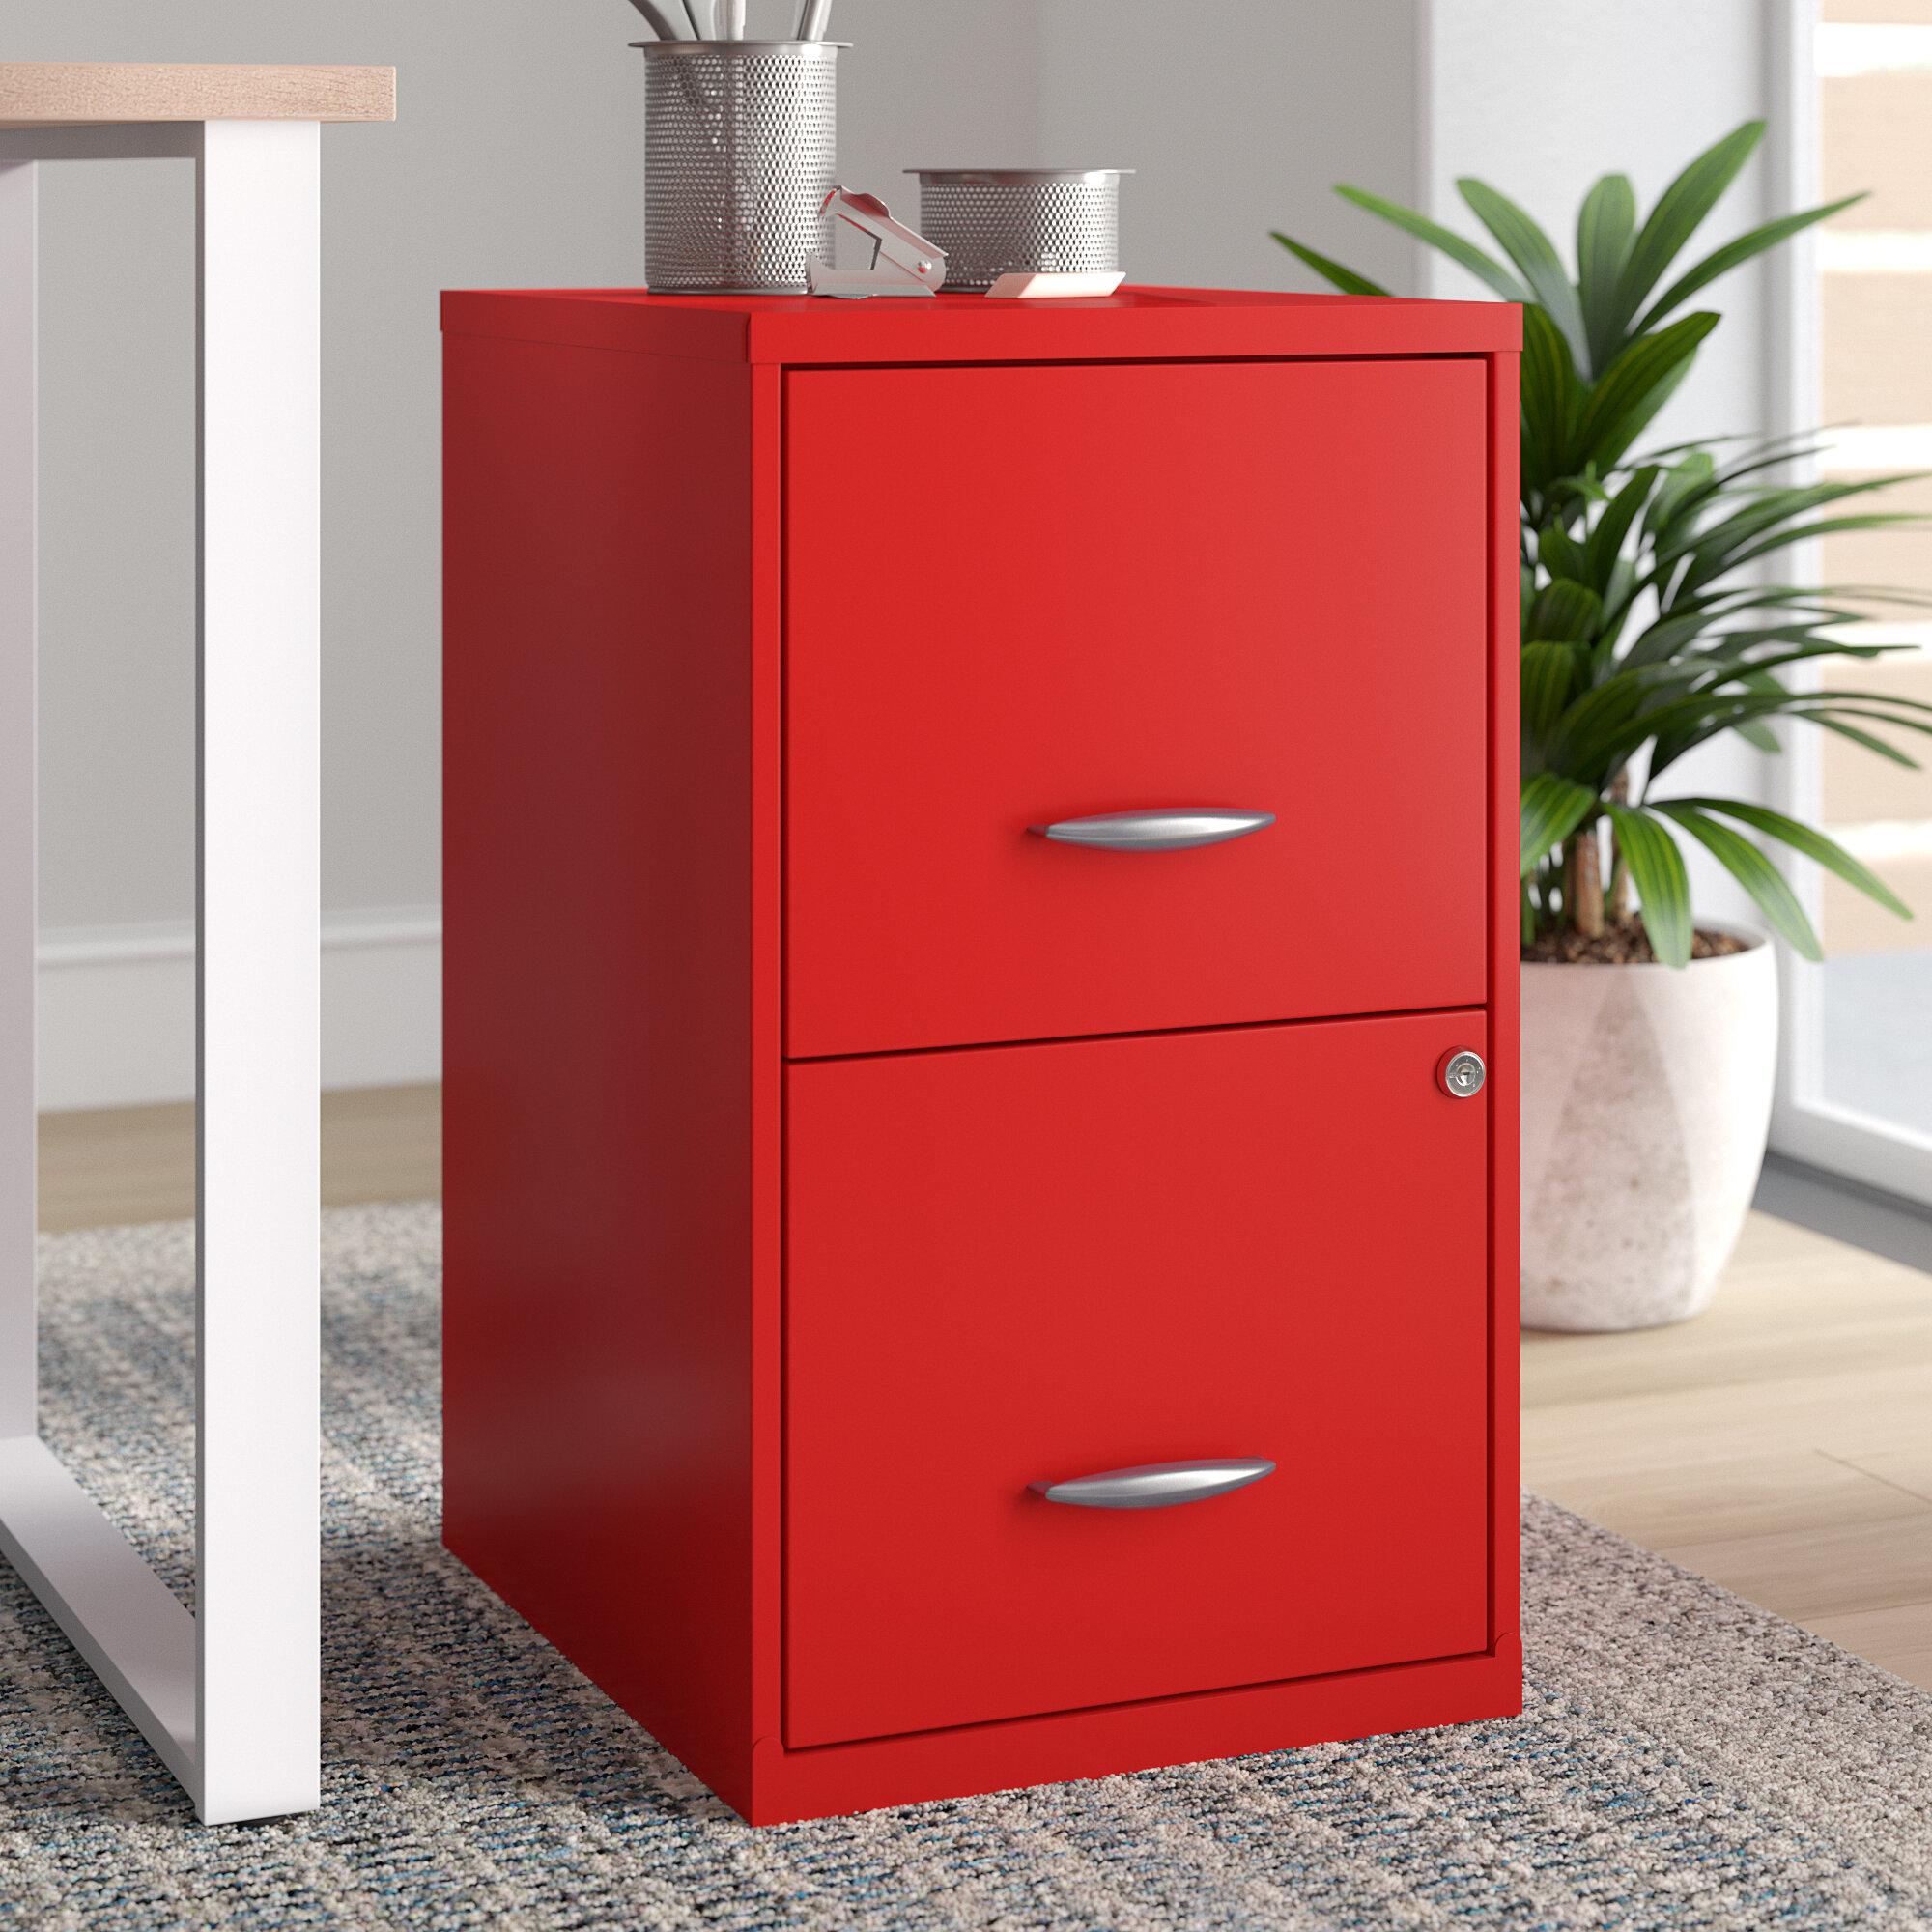 info for 6a86c 1144c Zimmer Deep 2-Drawer Vertical Filing Cabinet